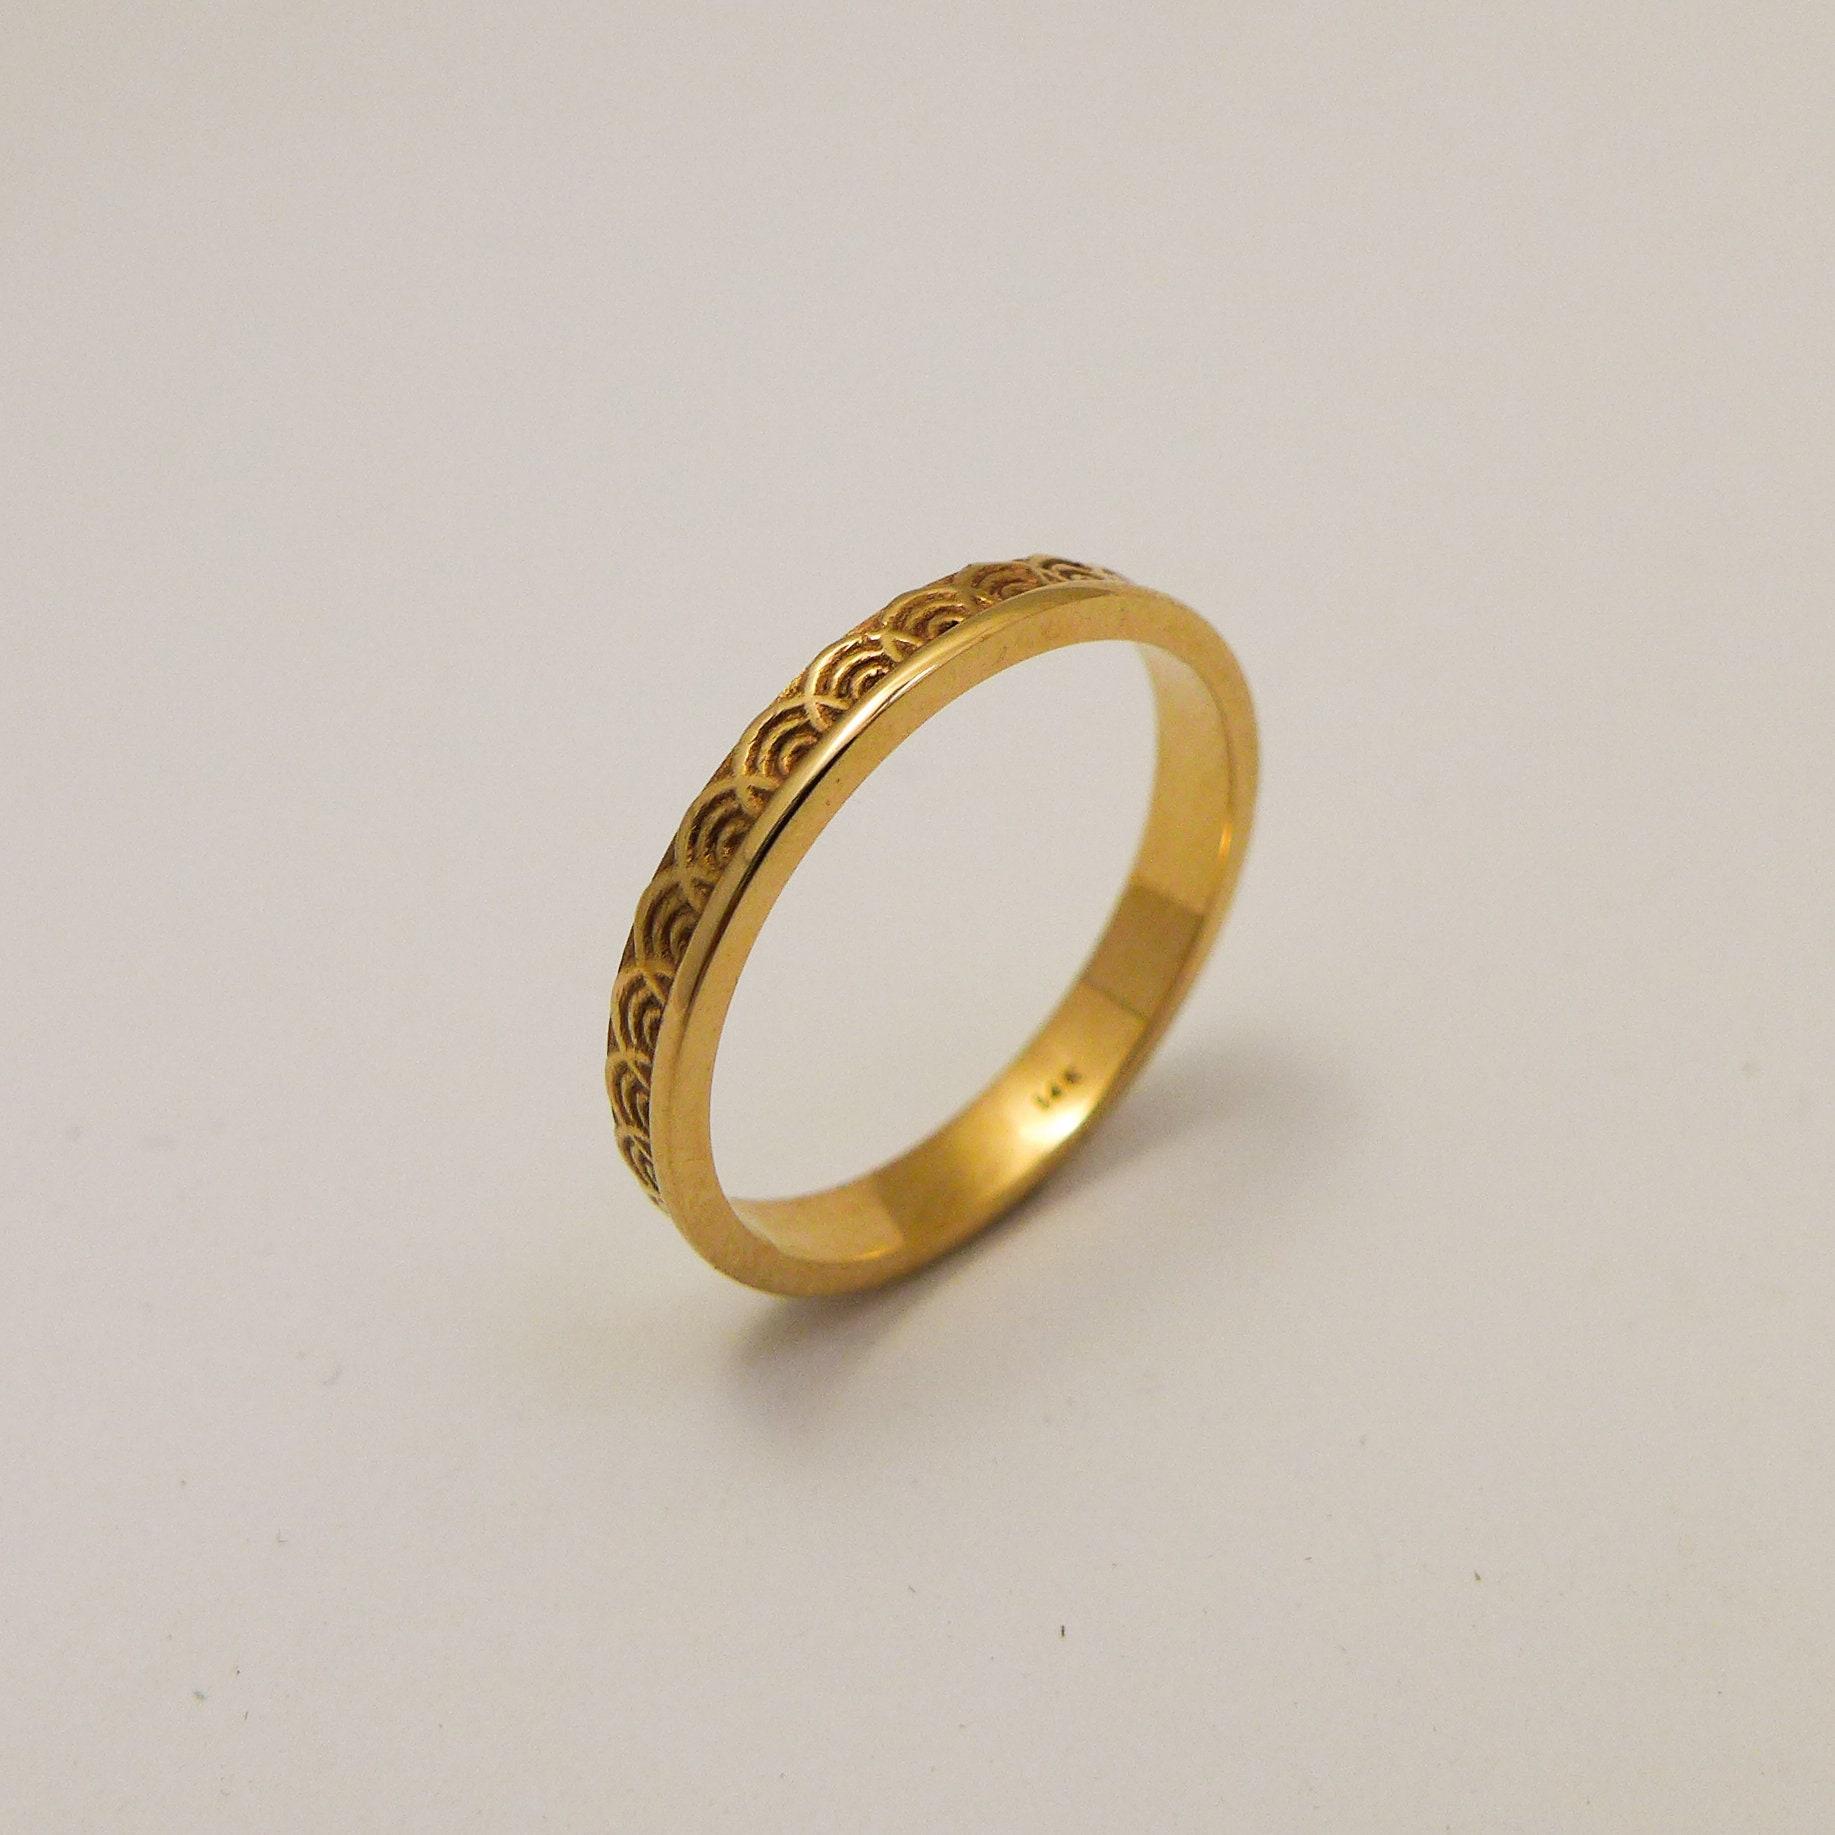 50: Simple Unique Wedding Rings At Reisefeber.org